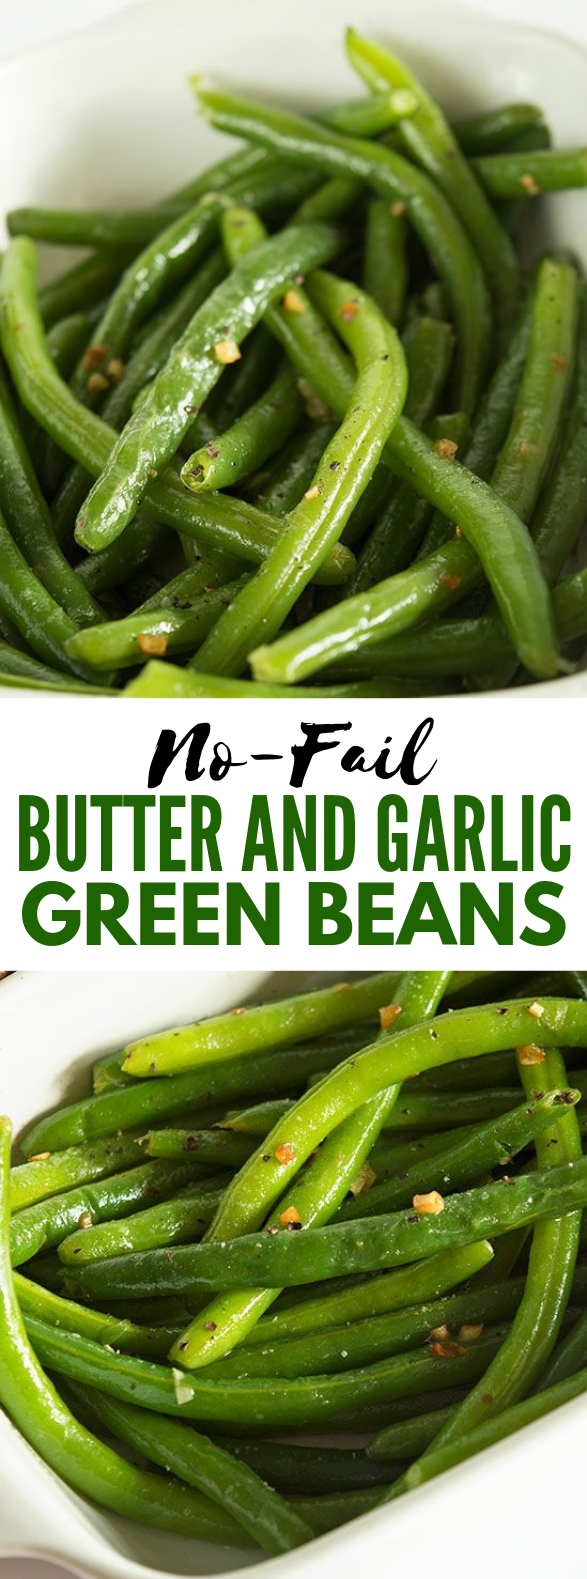 No-fail Butter and Garlic Green Beans #vegetable #veggies